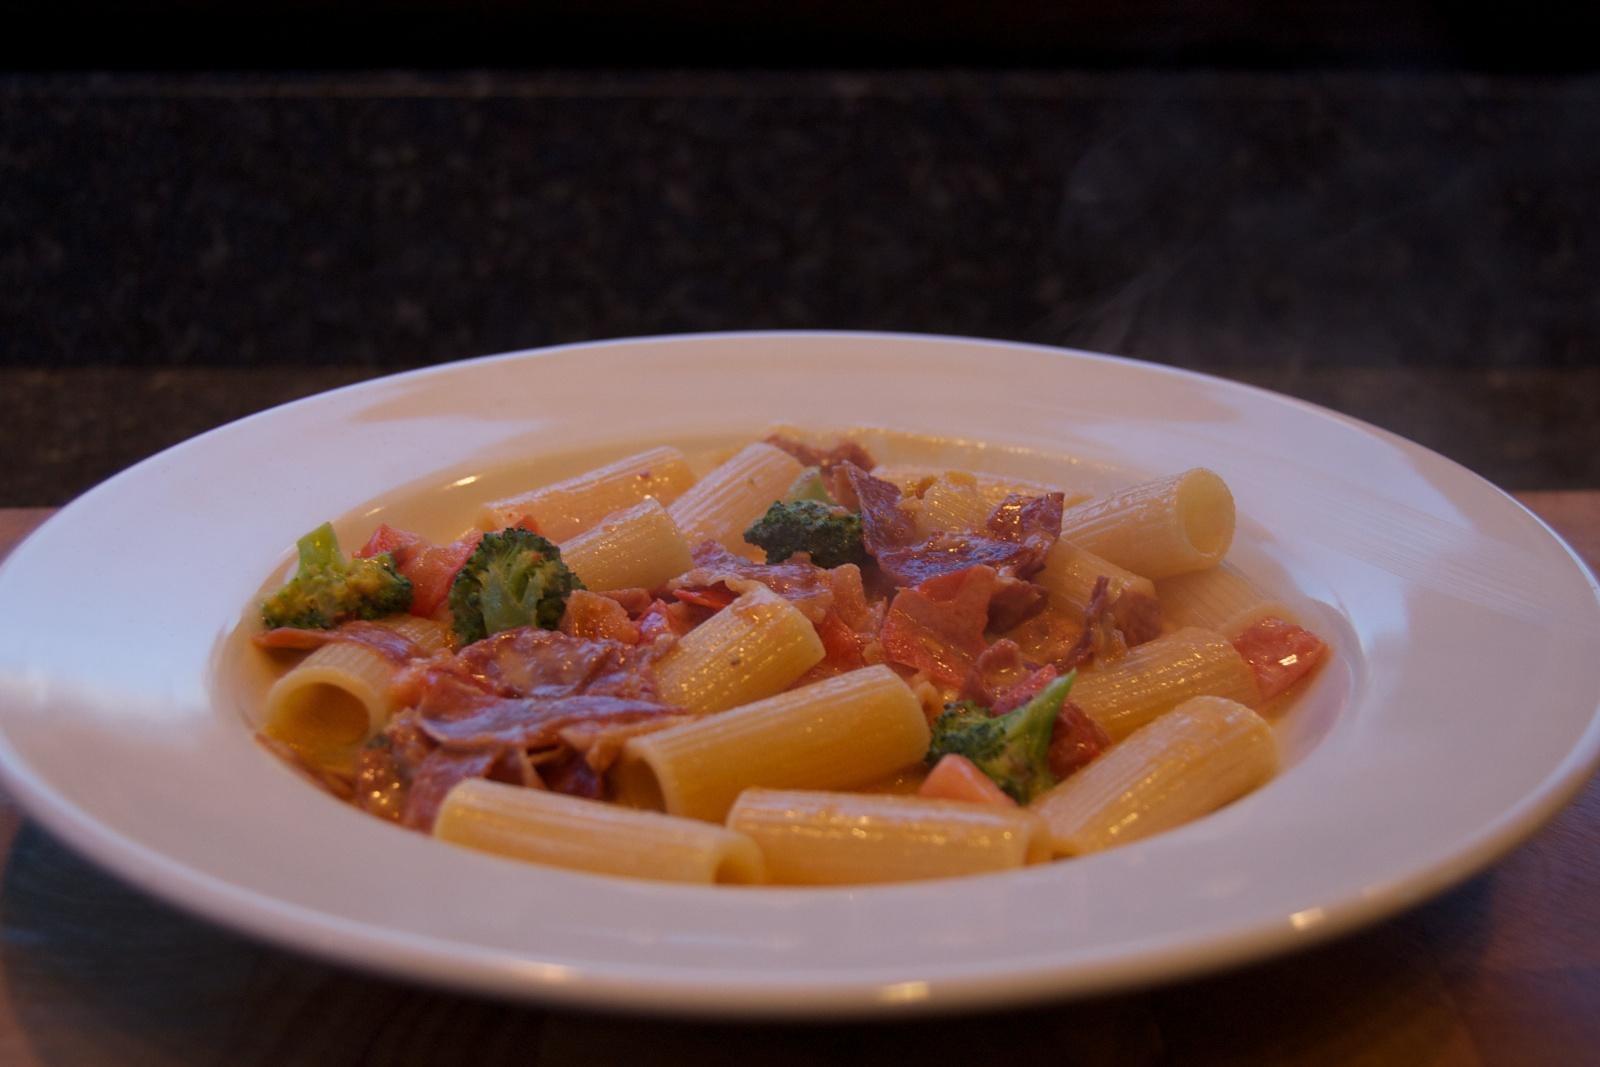 http://blog.rickk.com/food/2013/12/25/ate.2013.12.25.d.jpg